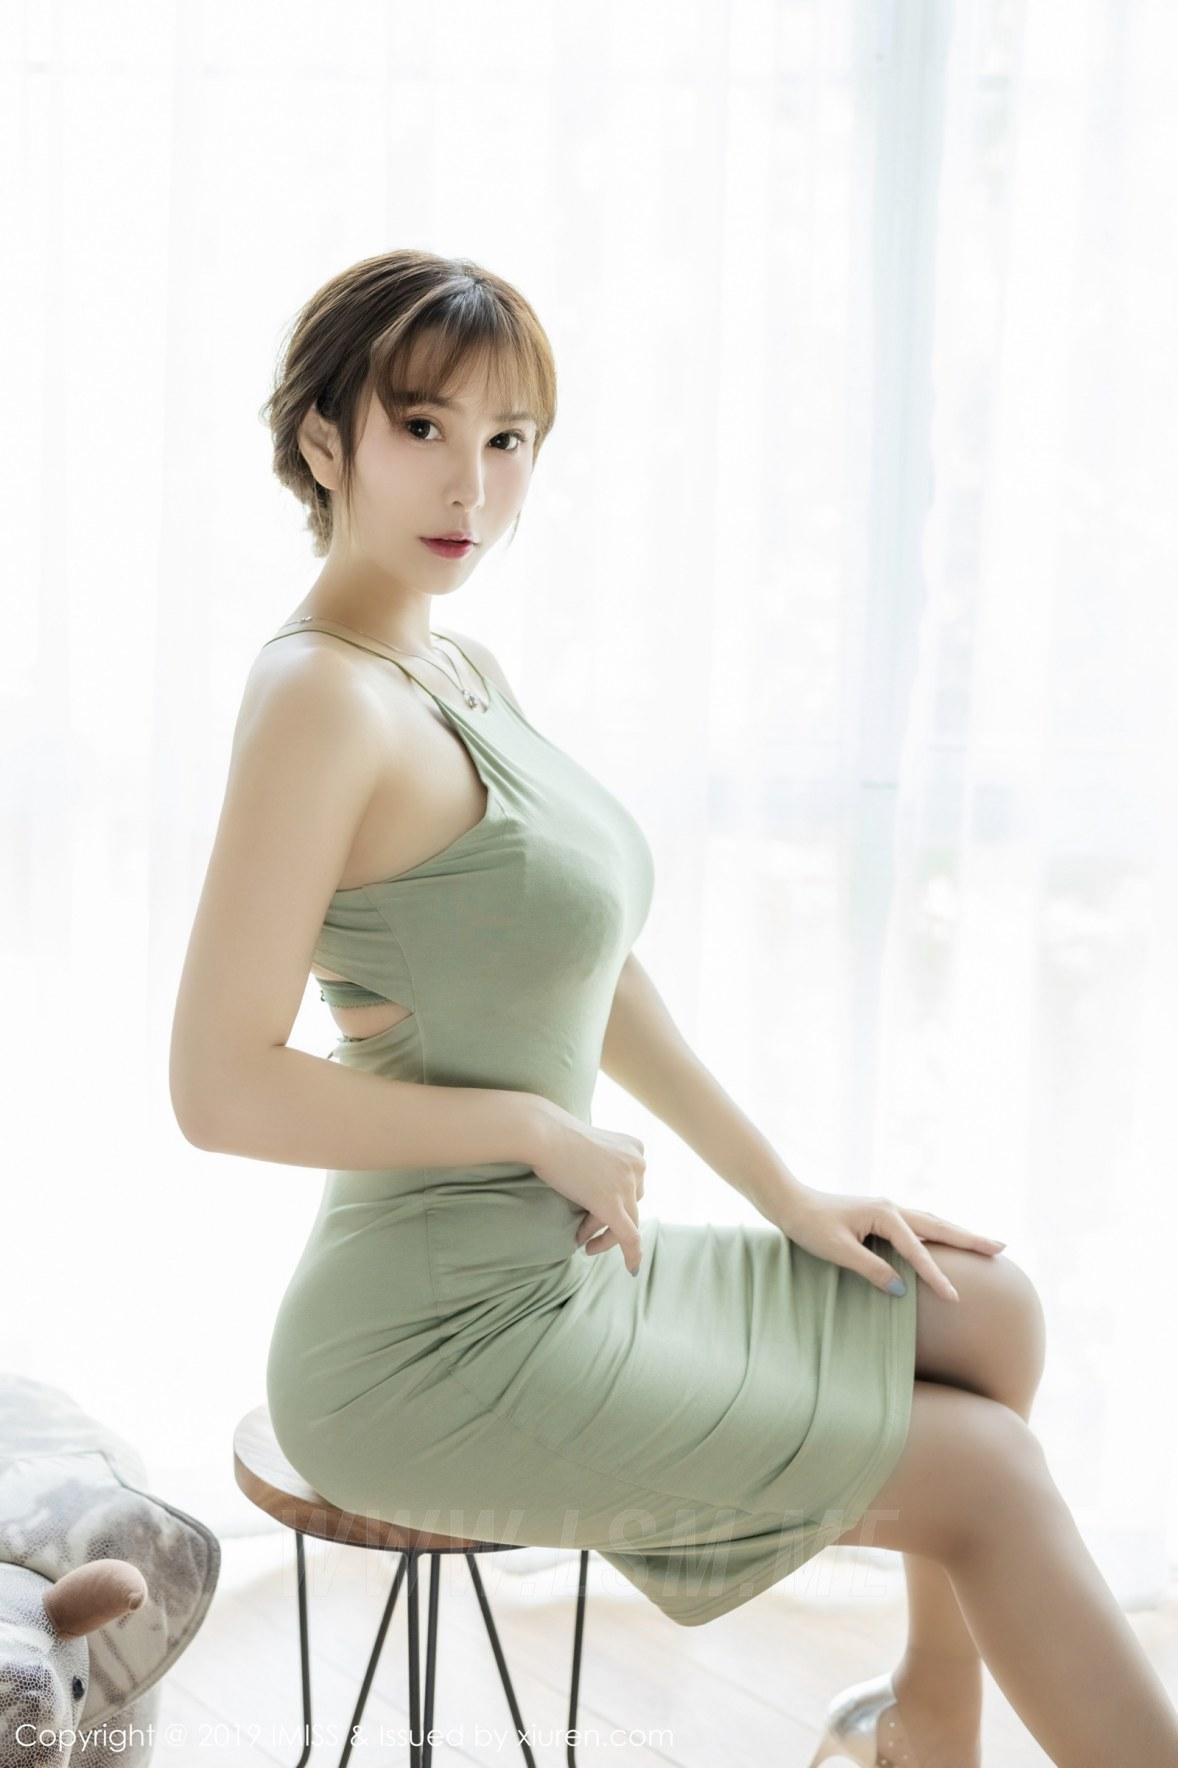 IMiss 爱蜜社 Vol.426 婀娜曼妙娇躯 Lavinia肉肉 泰国清迈旅拍 - 3